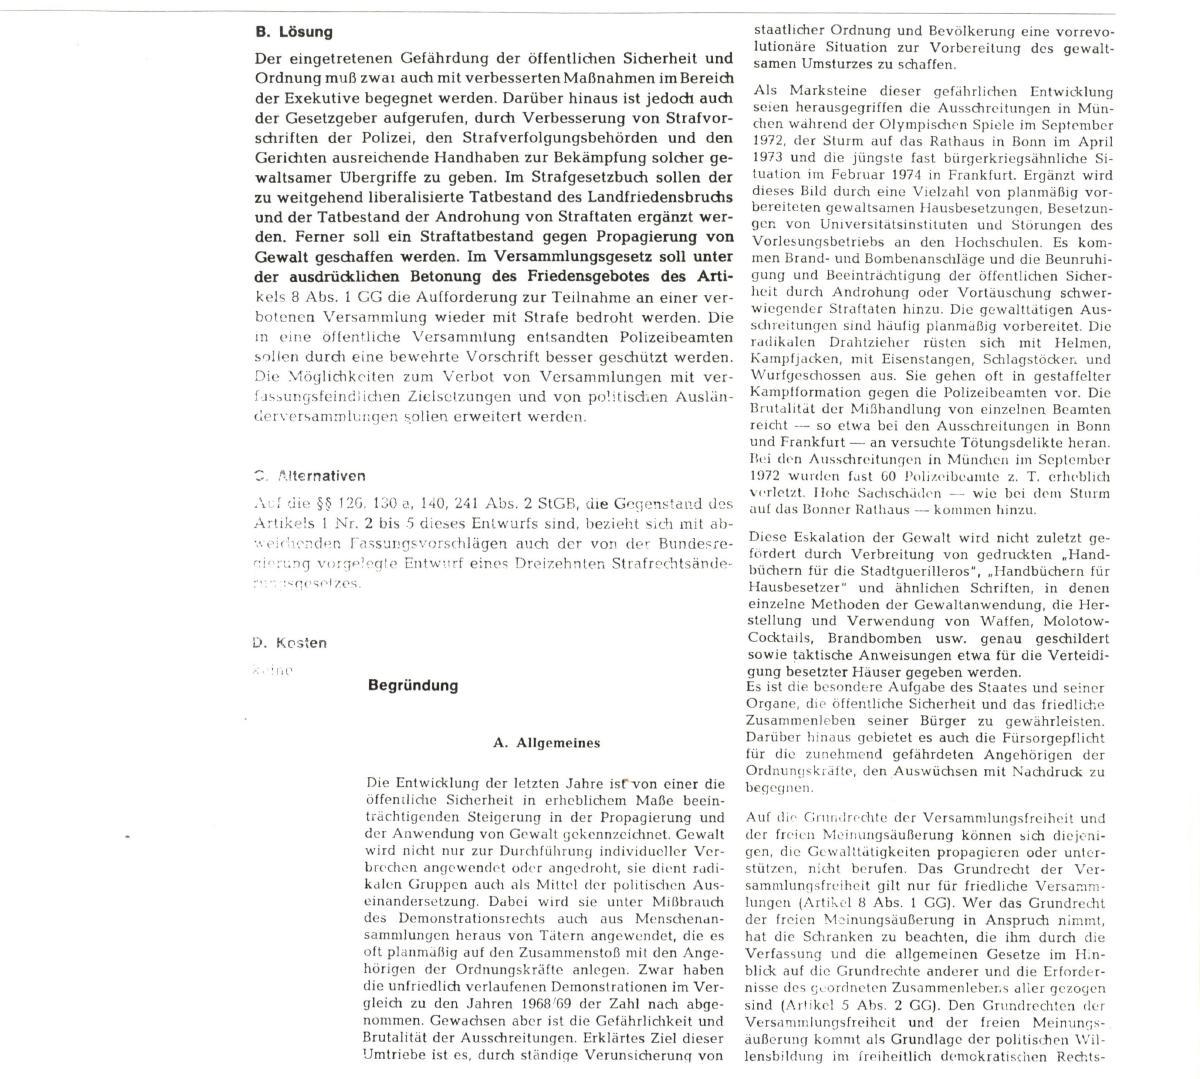 REP_VLB_1976_Die_Zensurgesetze_52